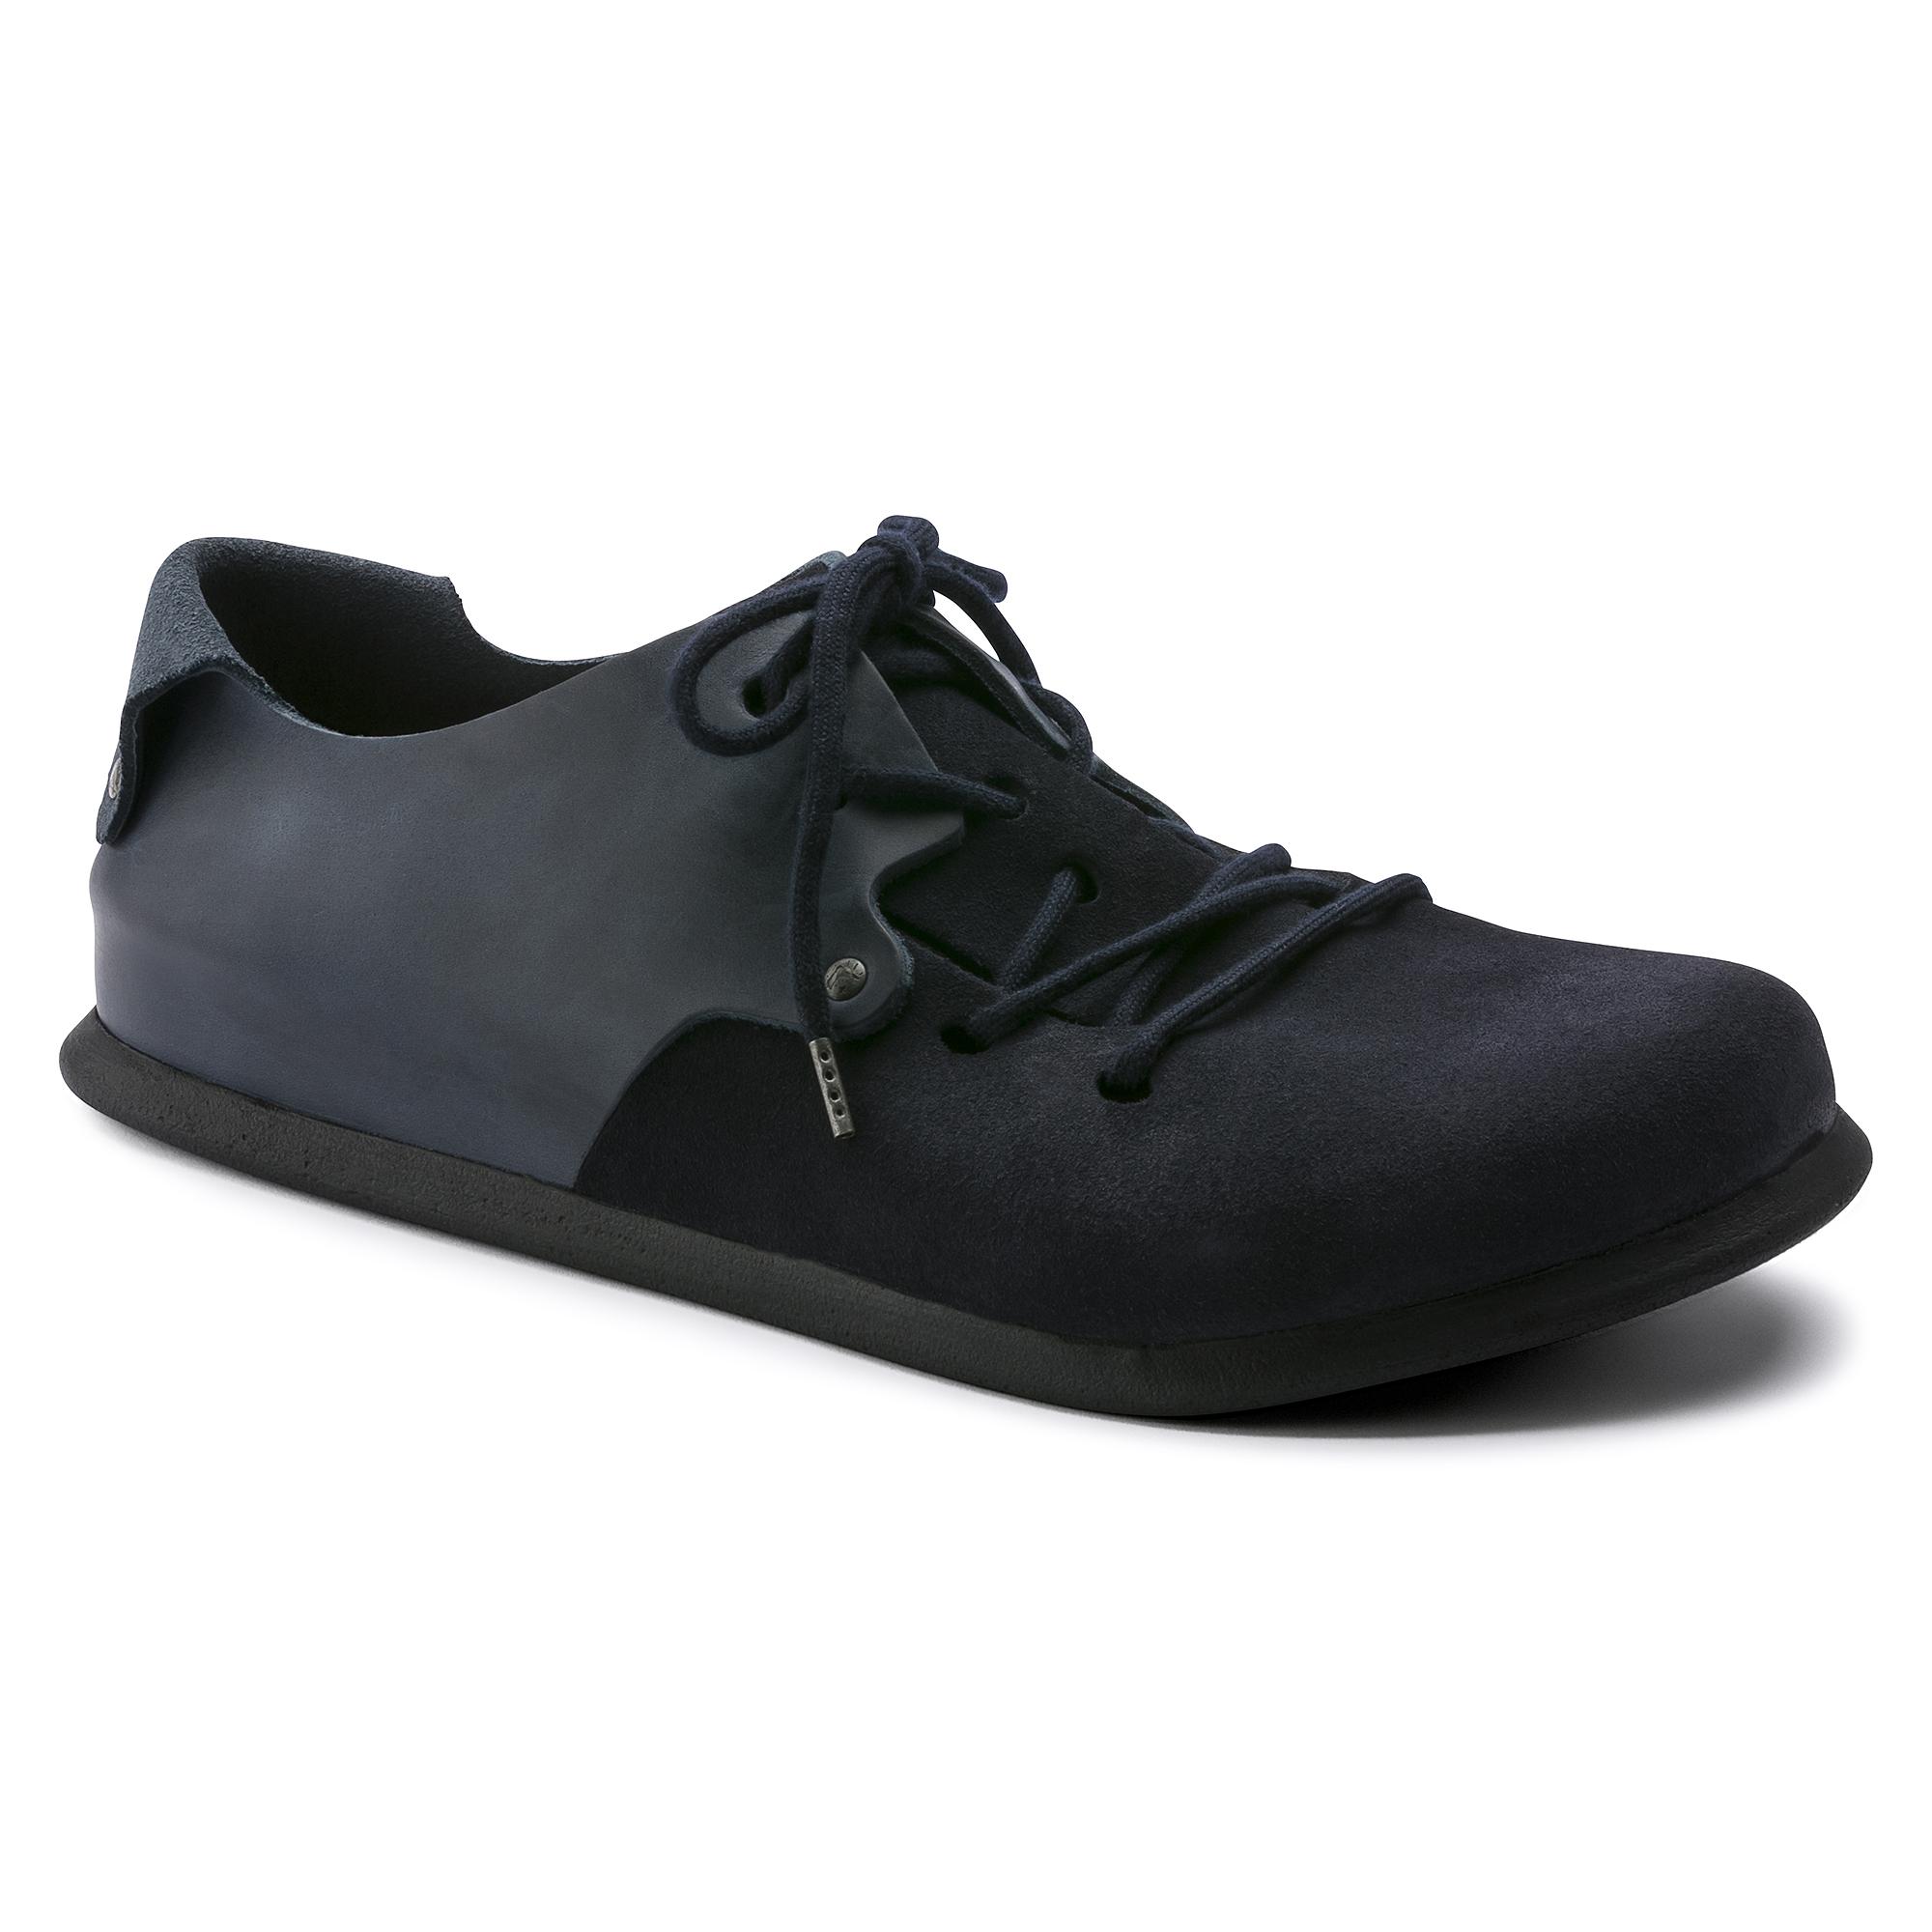 parrilla Posible Geometría  Montana Oiled Leather/Suede Leather Ebony | BIRKENSTOCK